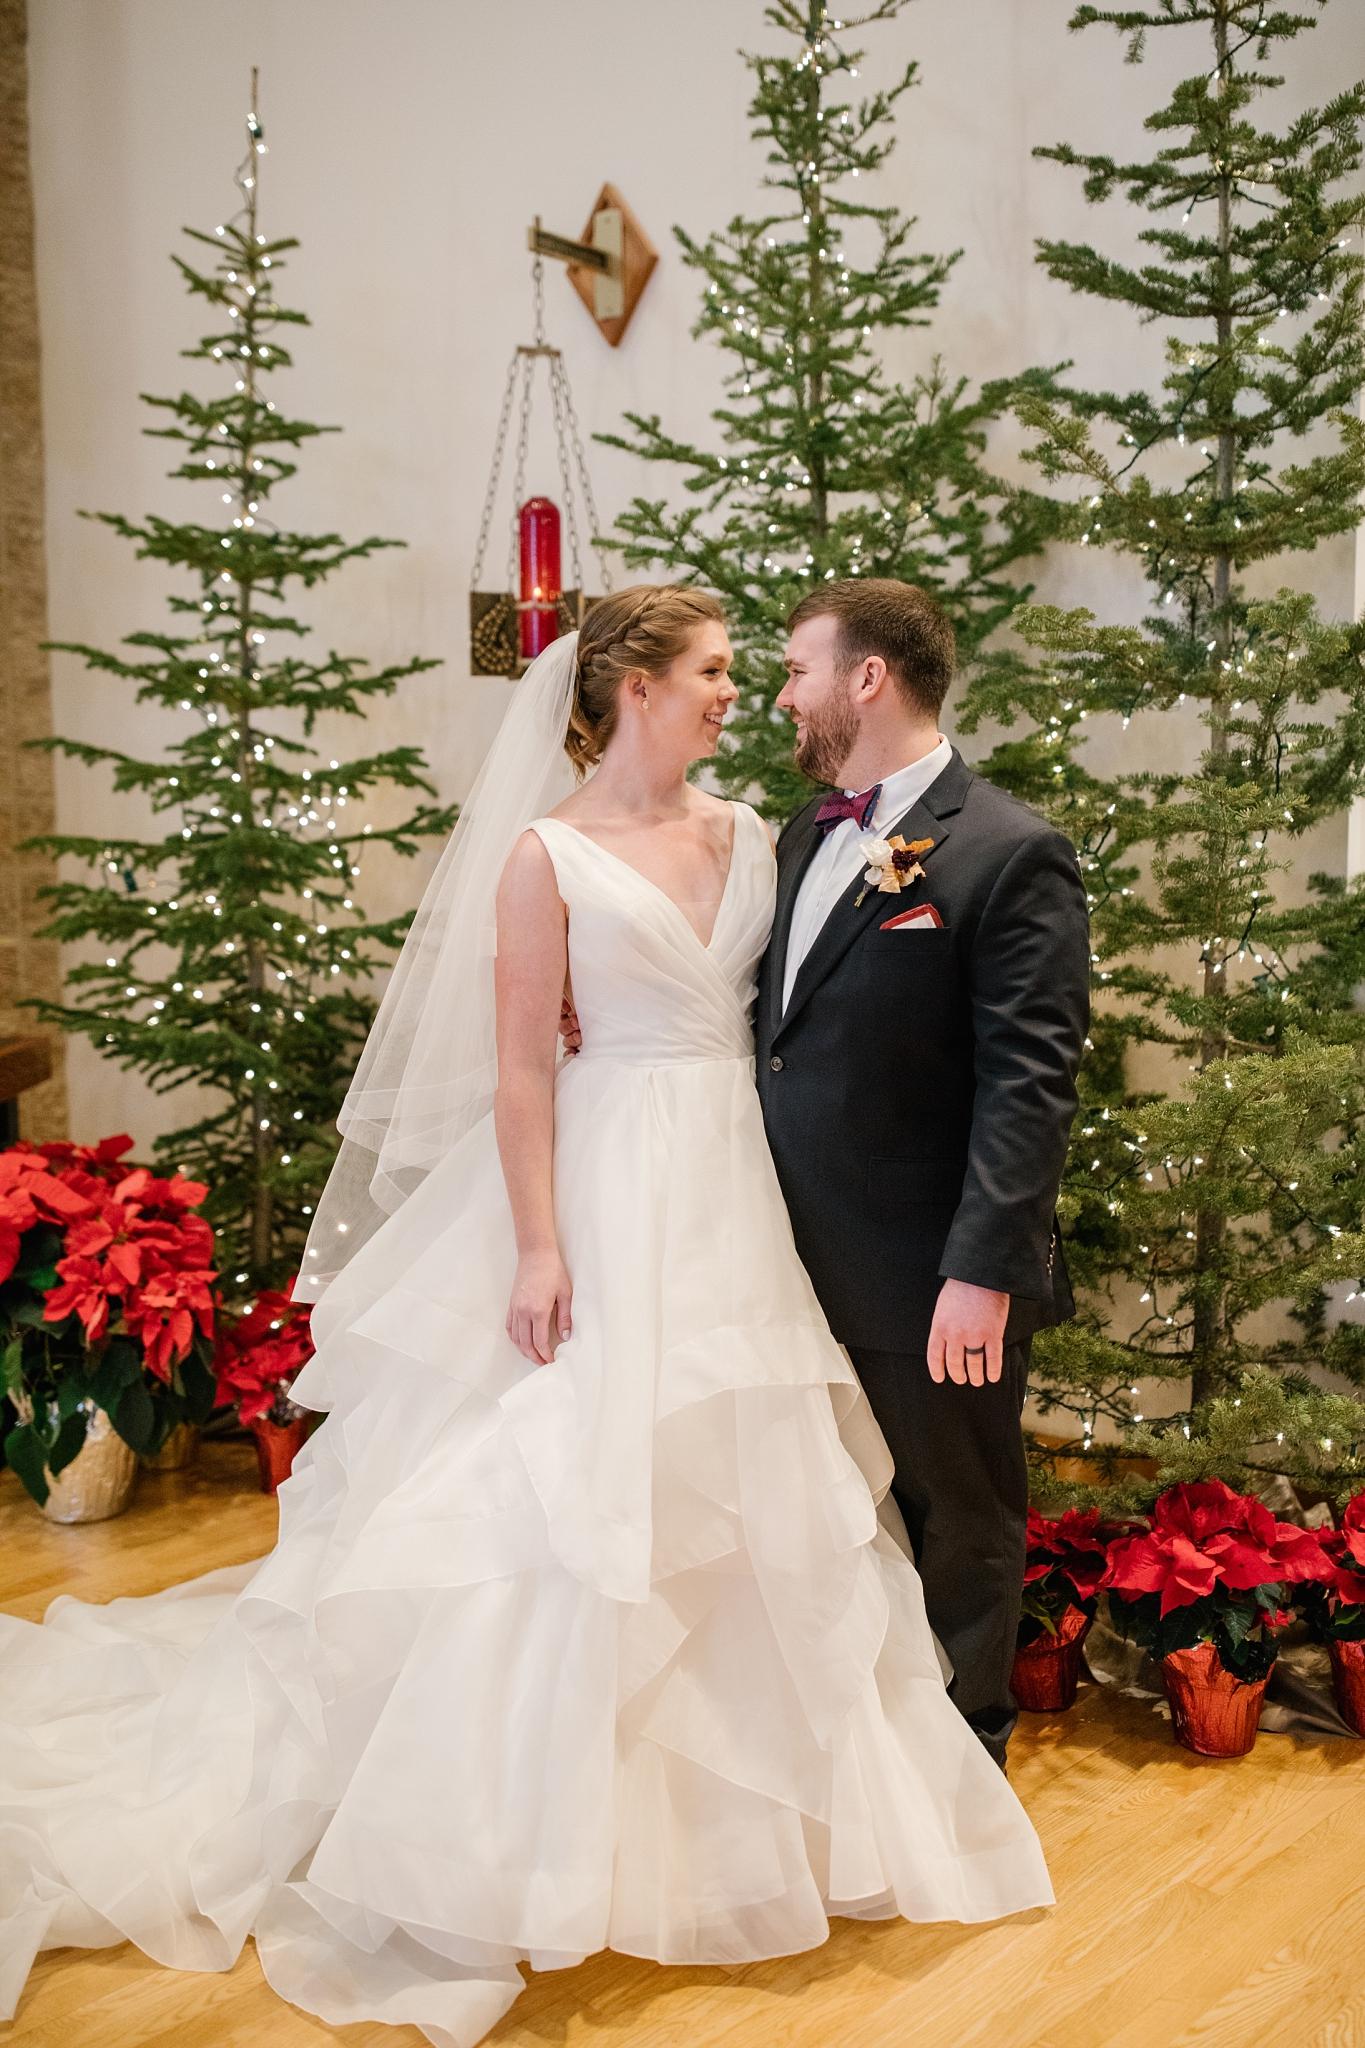 CN-Wedding-207_Lizzie-B-Imagery-Utah-Wedding-Photographer-Blessed-Sacrament-Catholic-Church-Sandy-Utah-The-Blended-Table-Salt-Lake-City.jpg